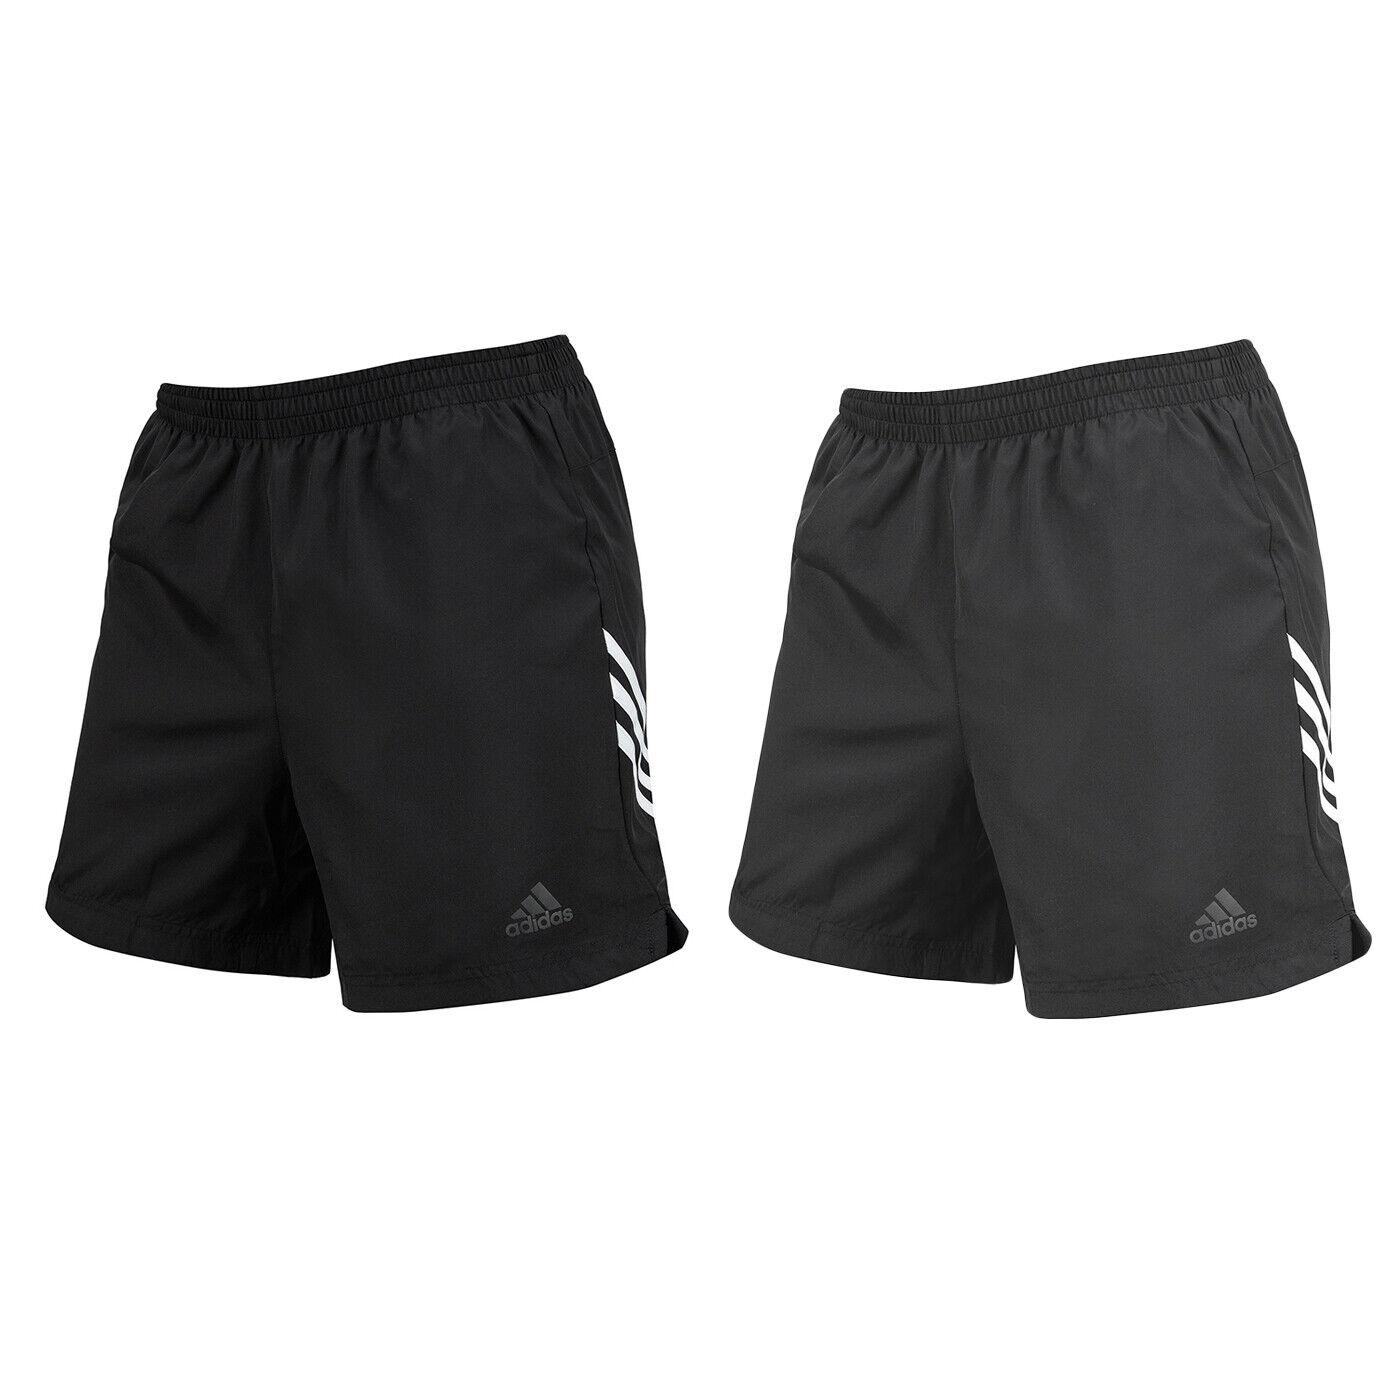 Dk Grey Germany Training Shorts